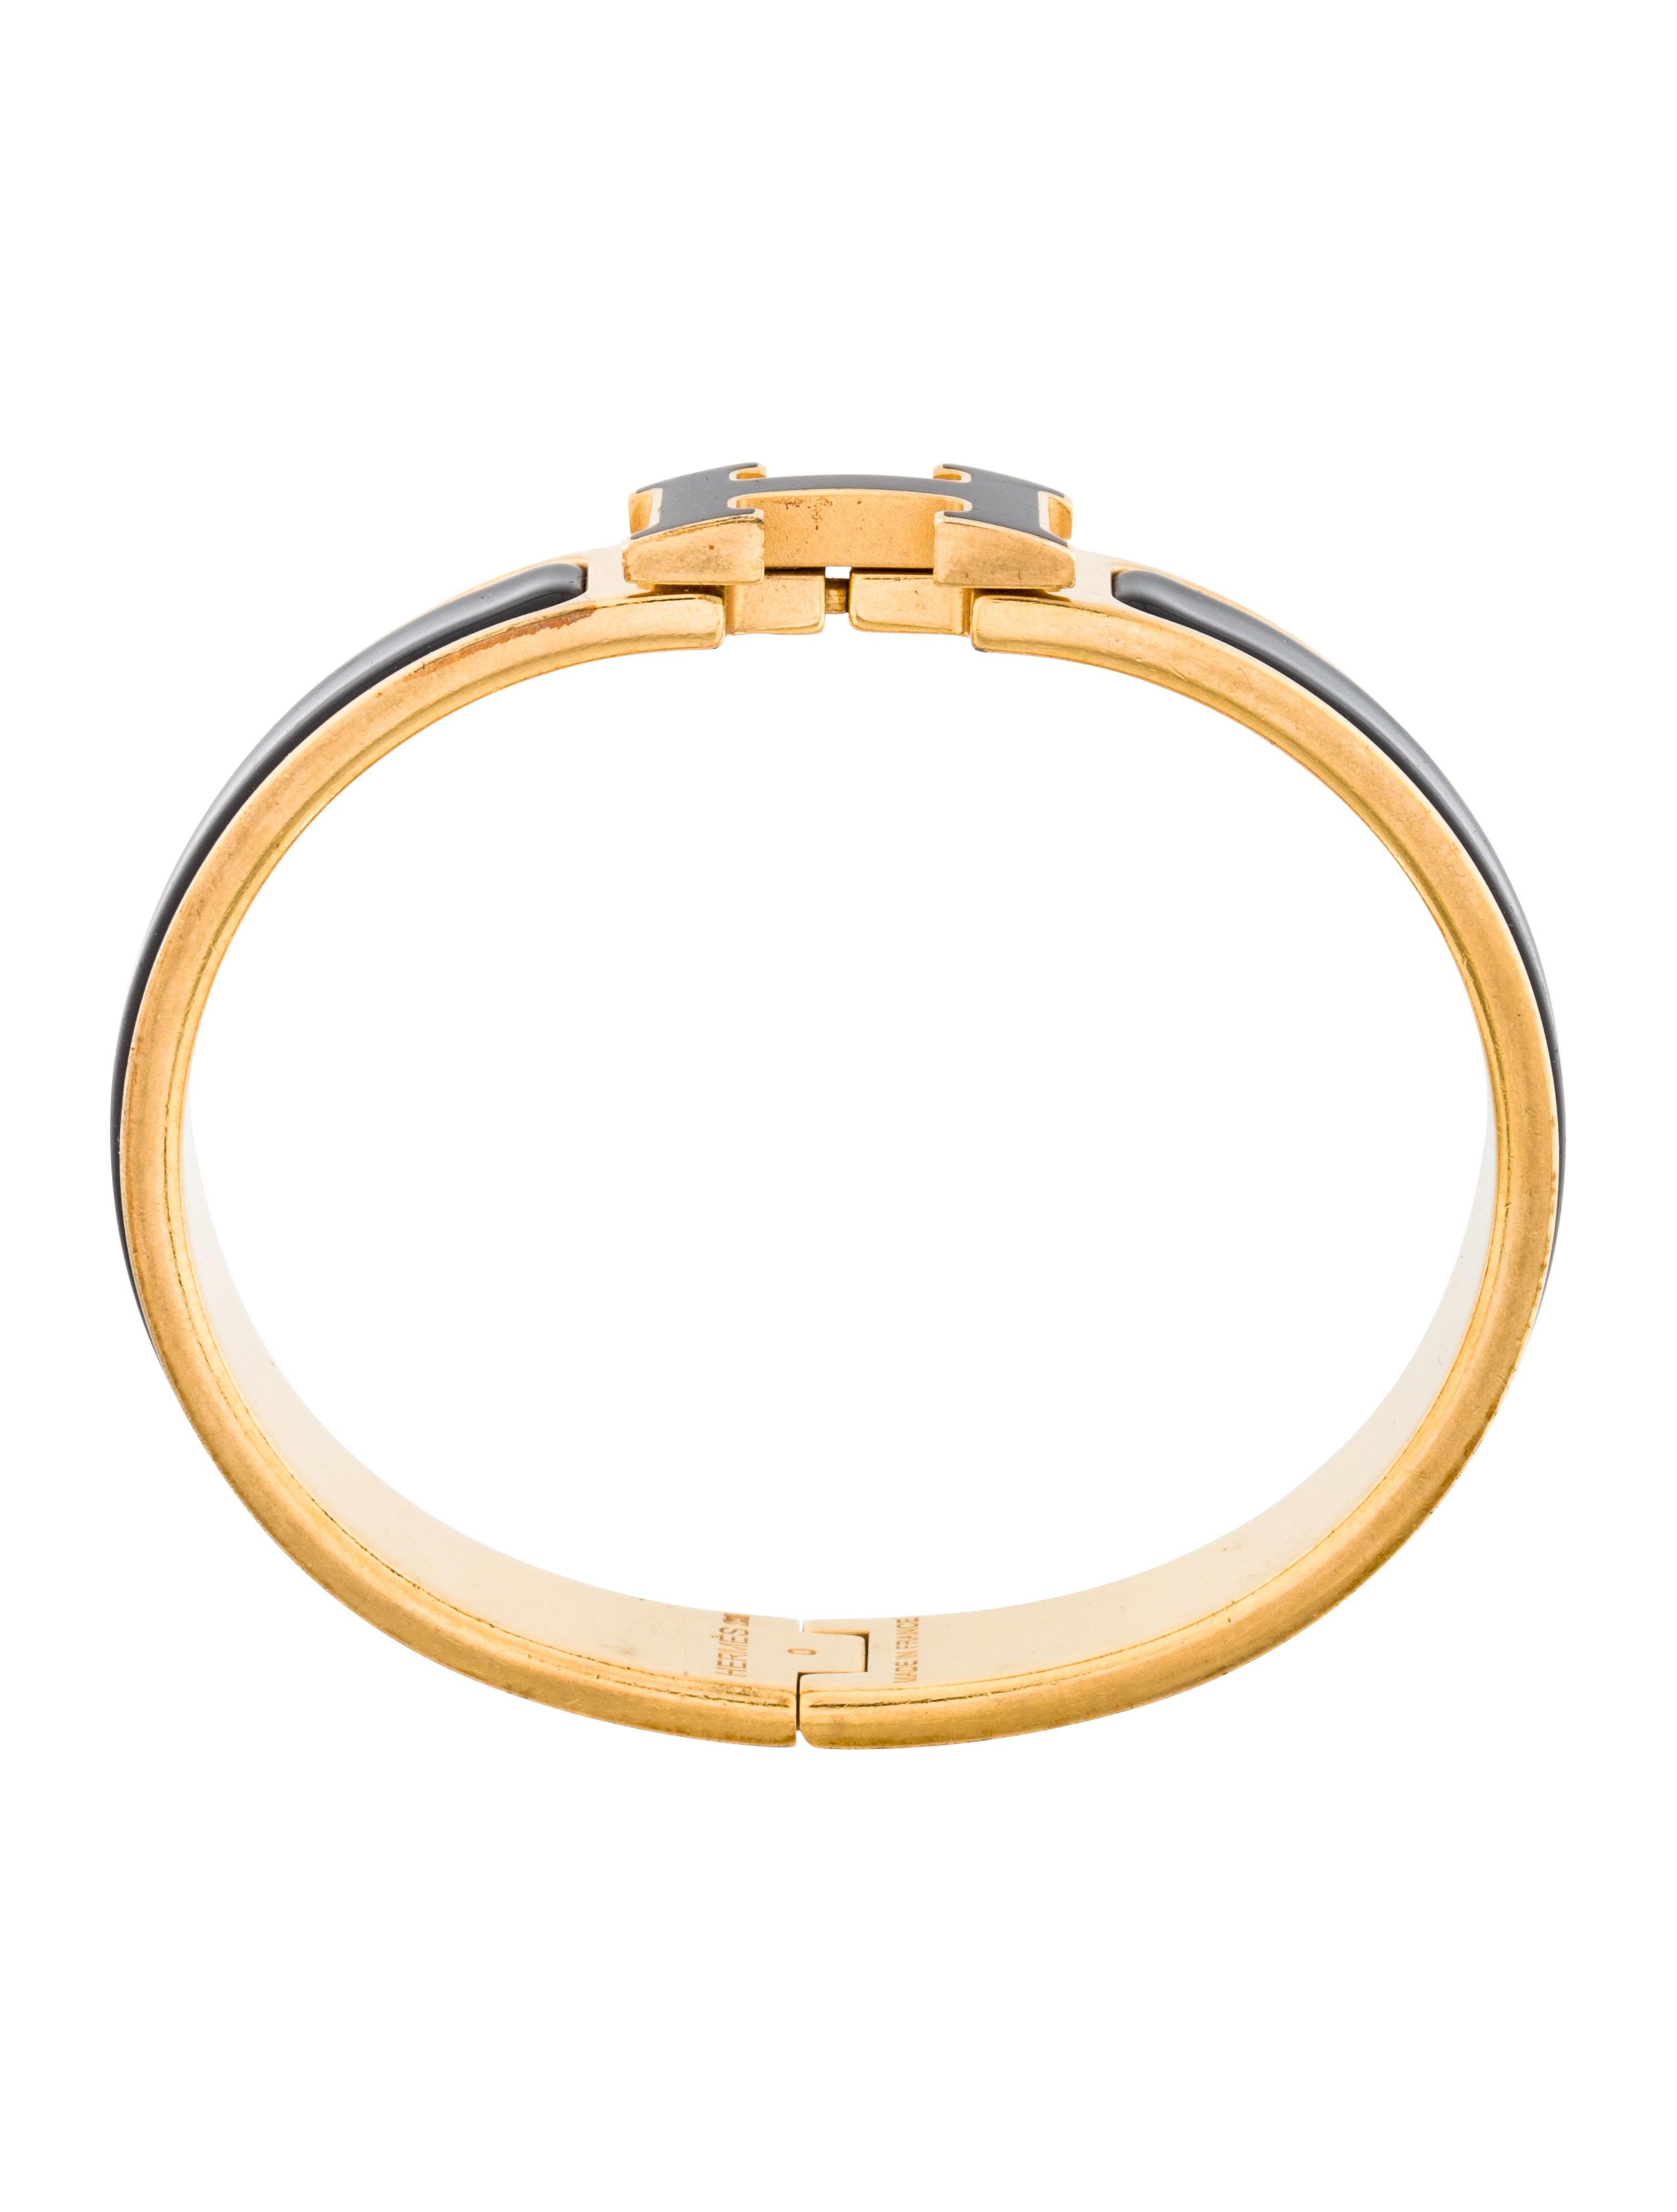 herm s narrow clic clac h bracelet bracelets her92132. Black Bedroom Furniture Sets. Home Design Ideas